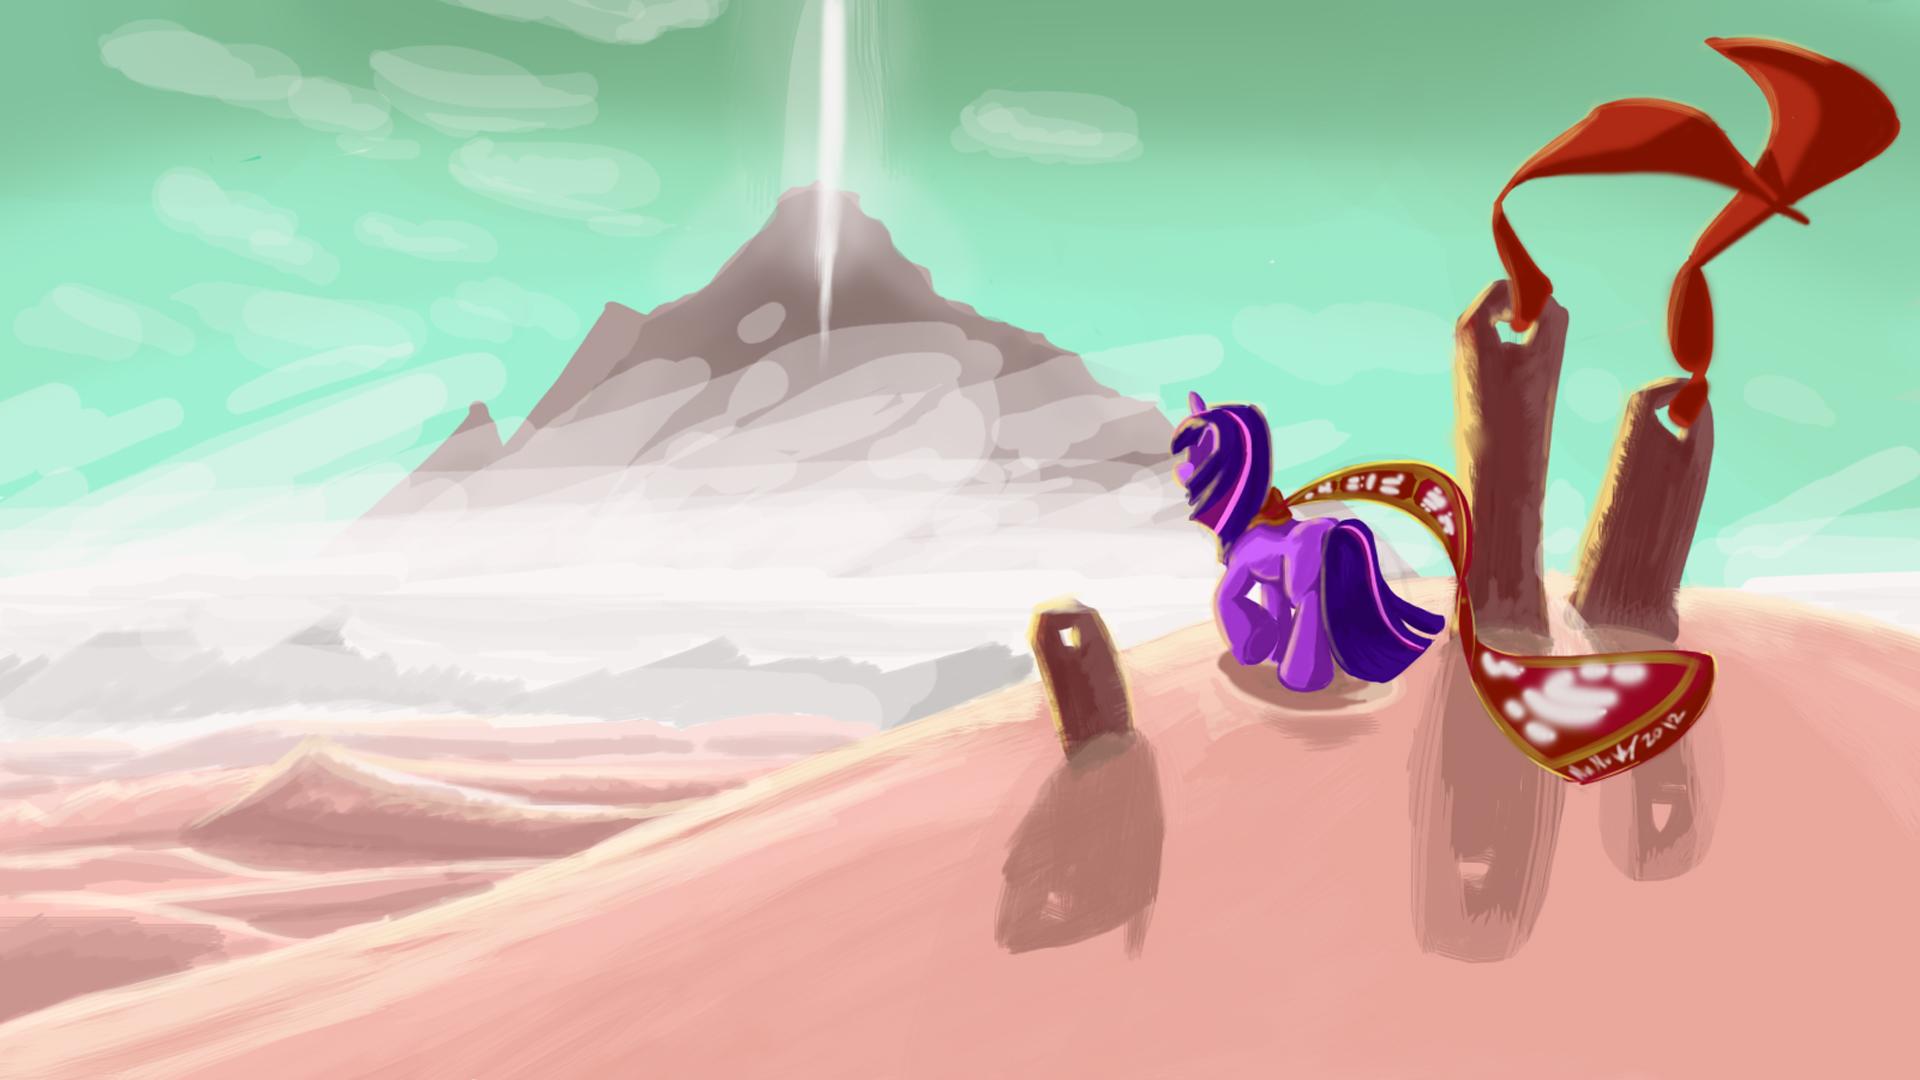 journey game art wallpaper - photo #28